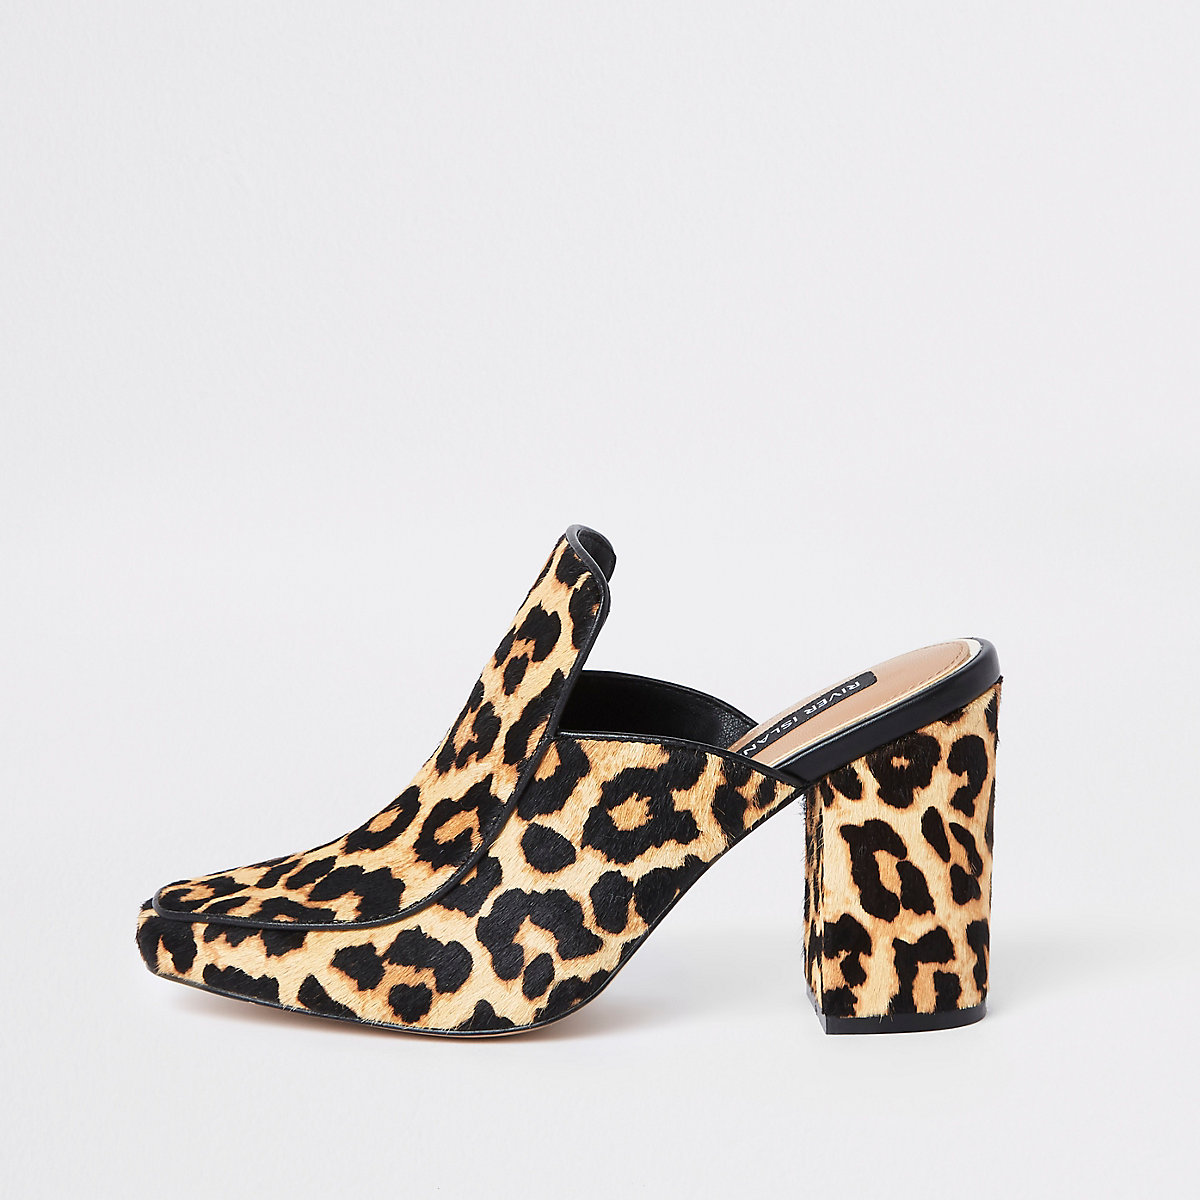 Brown leather leopard print mule